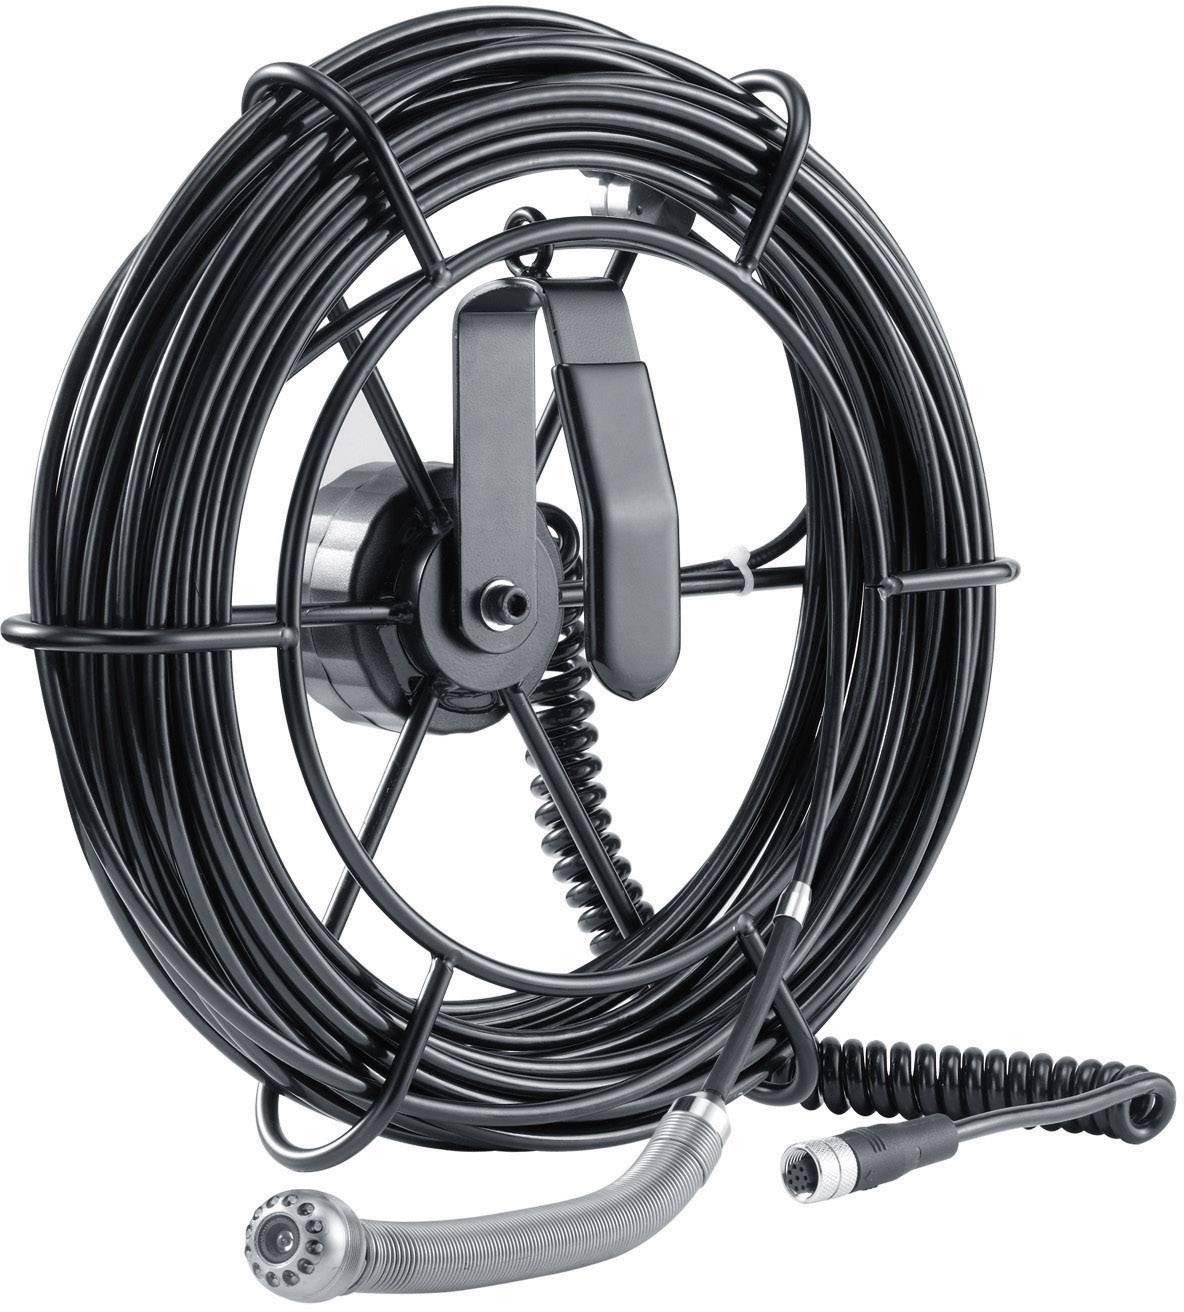 Sonda na endoskop Laserliner PipeControlMobile-Camera vhodné pre Laserliner VideoControl-Master